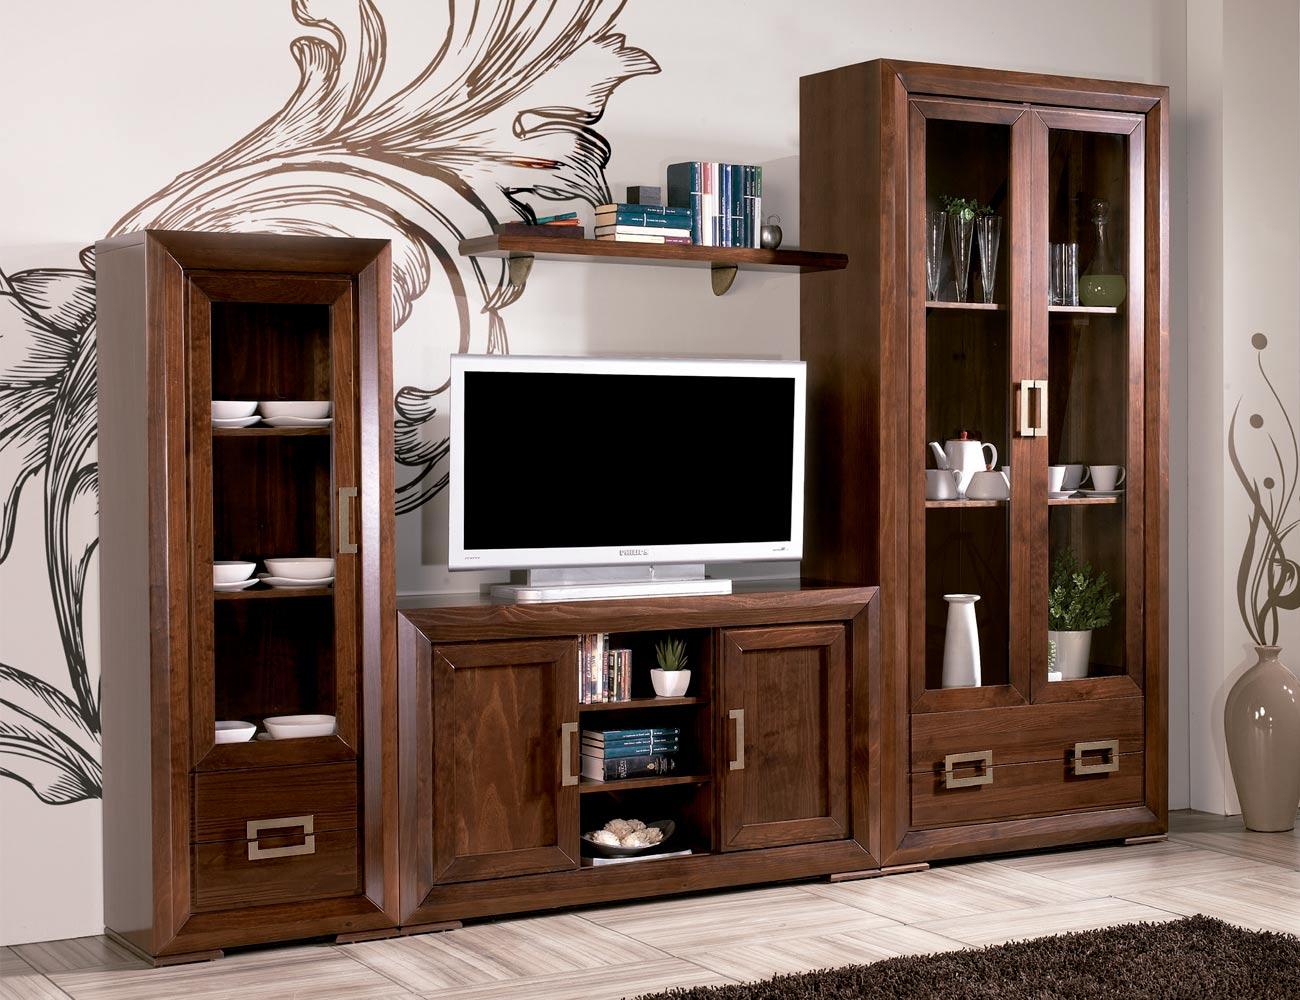 Composicion28 mueble salon comedor vitrinas madera